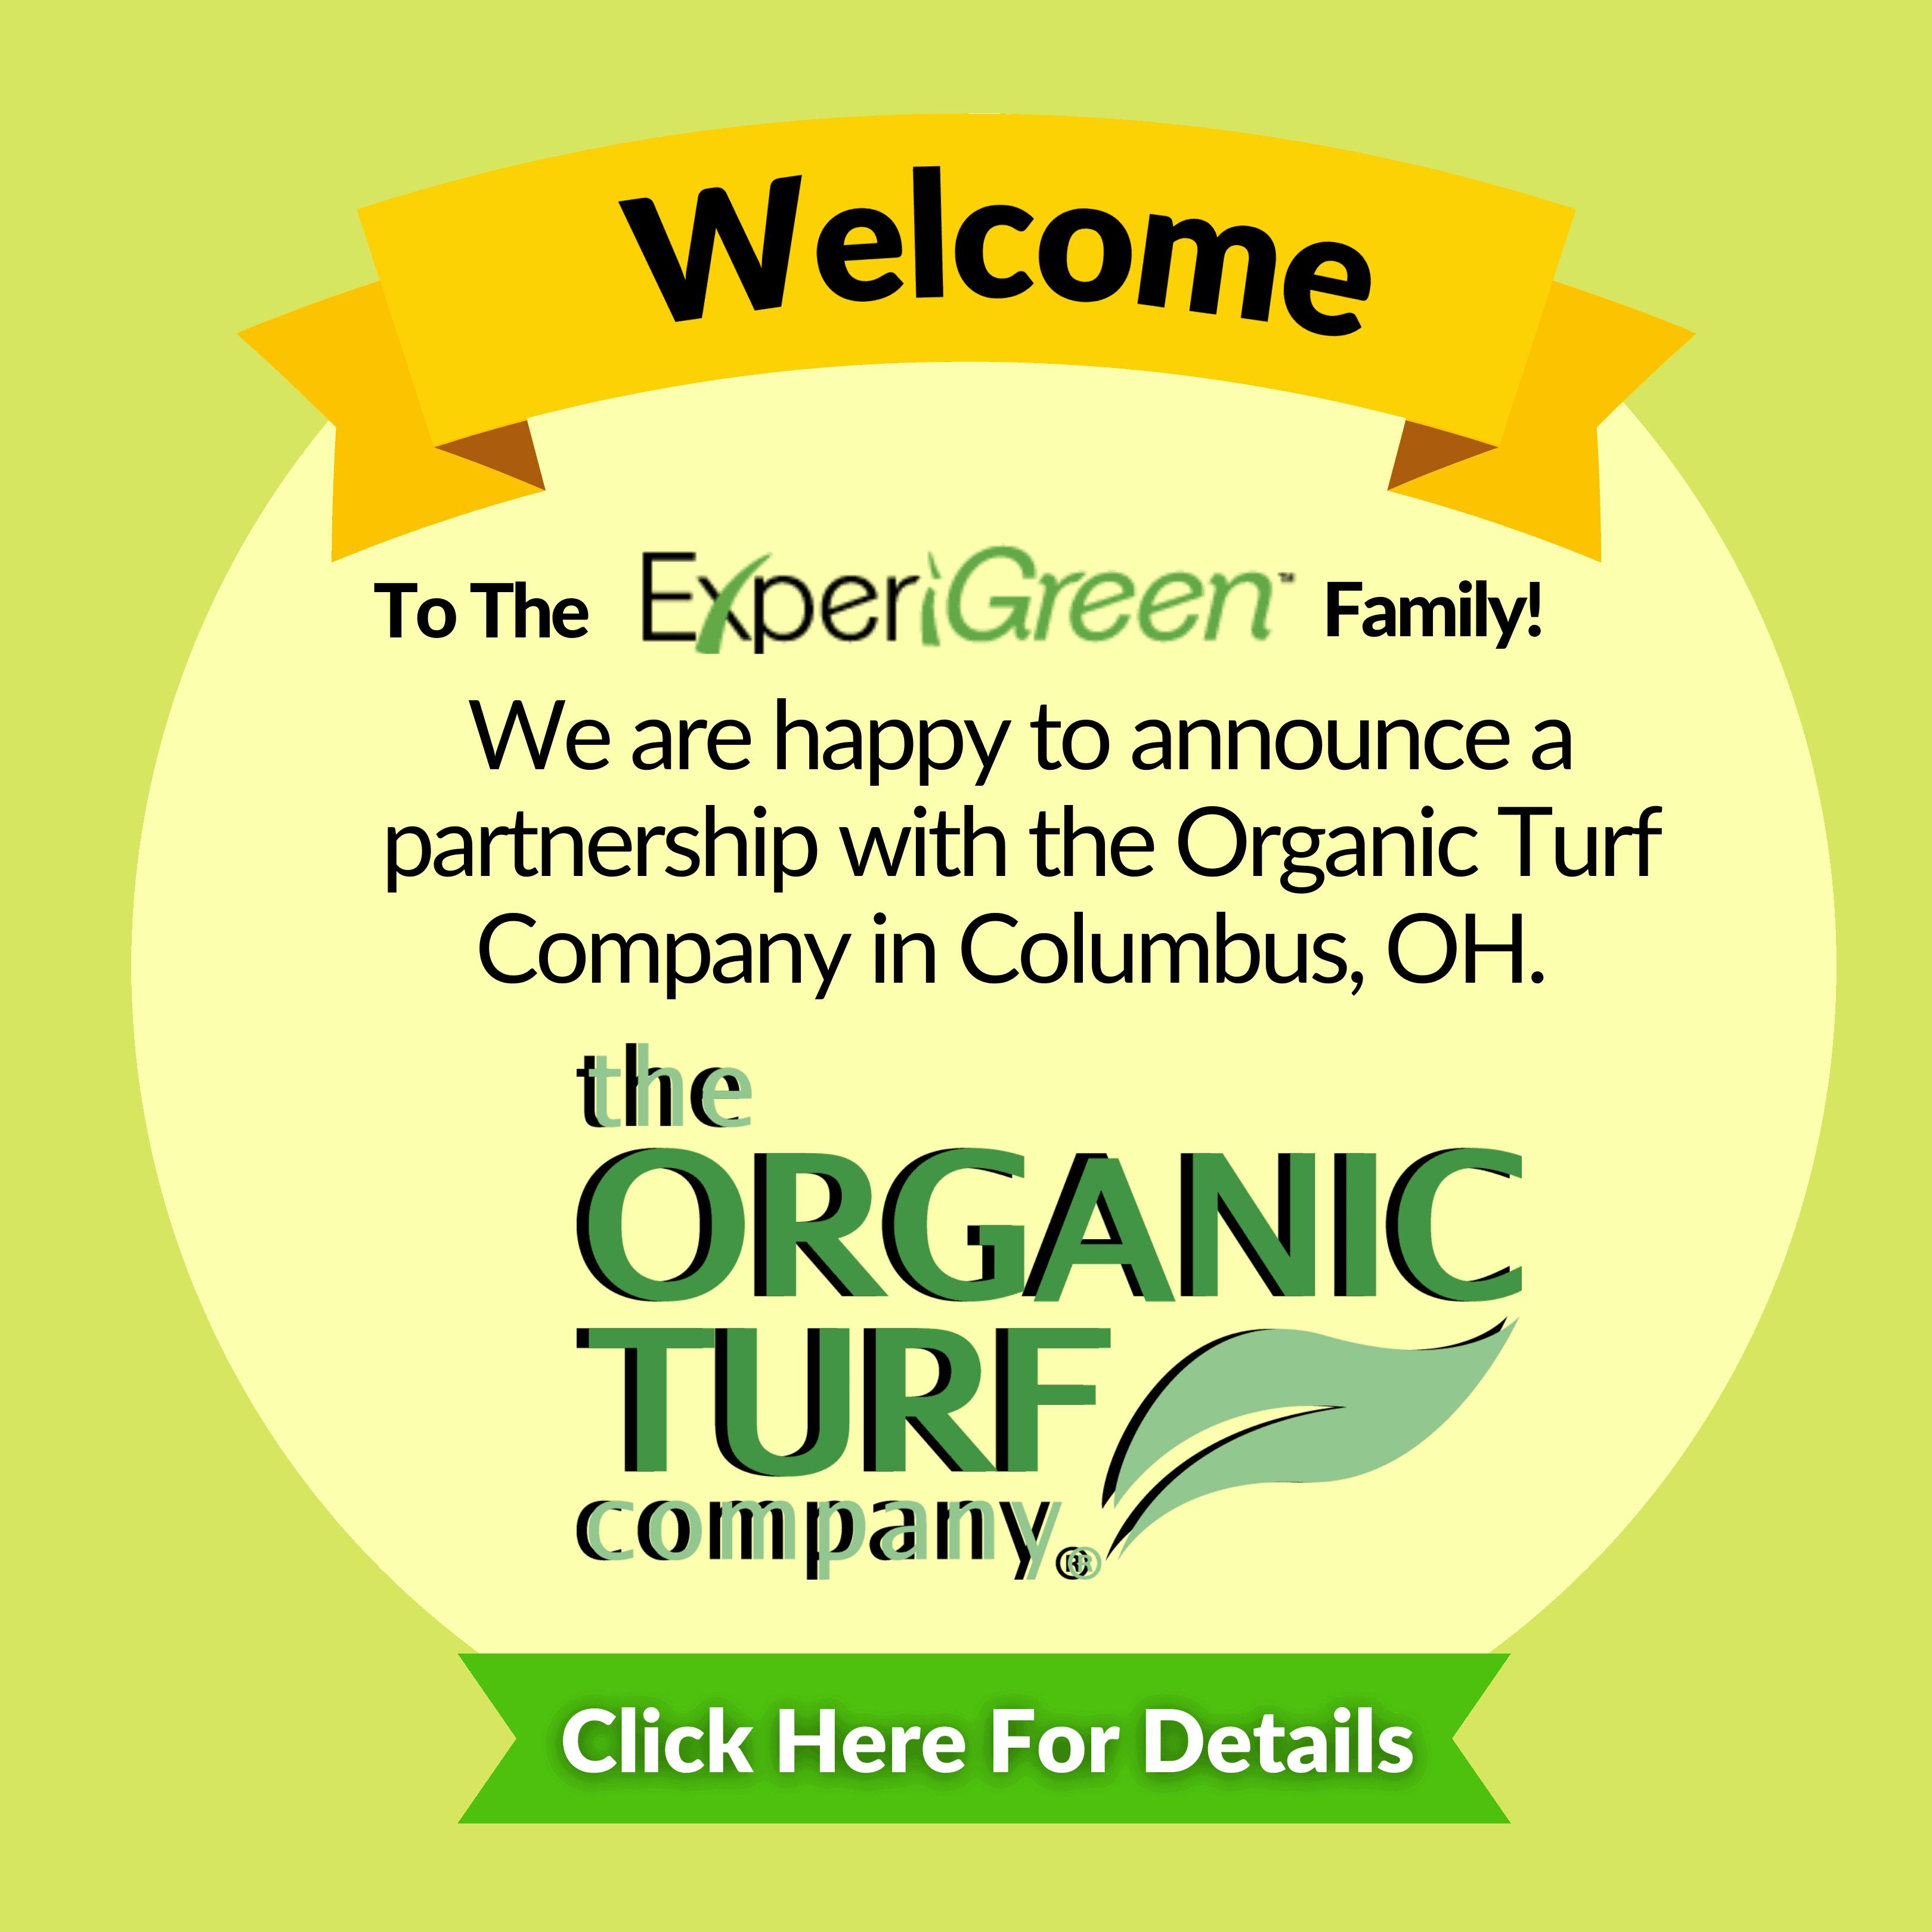 Welcome Customers Of The Organic Turf Company